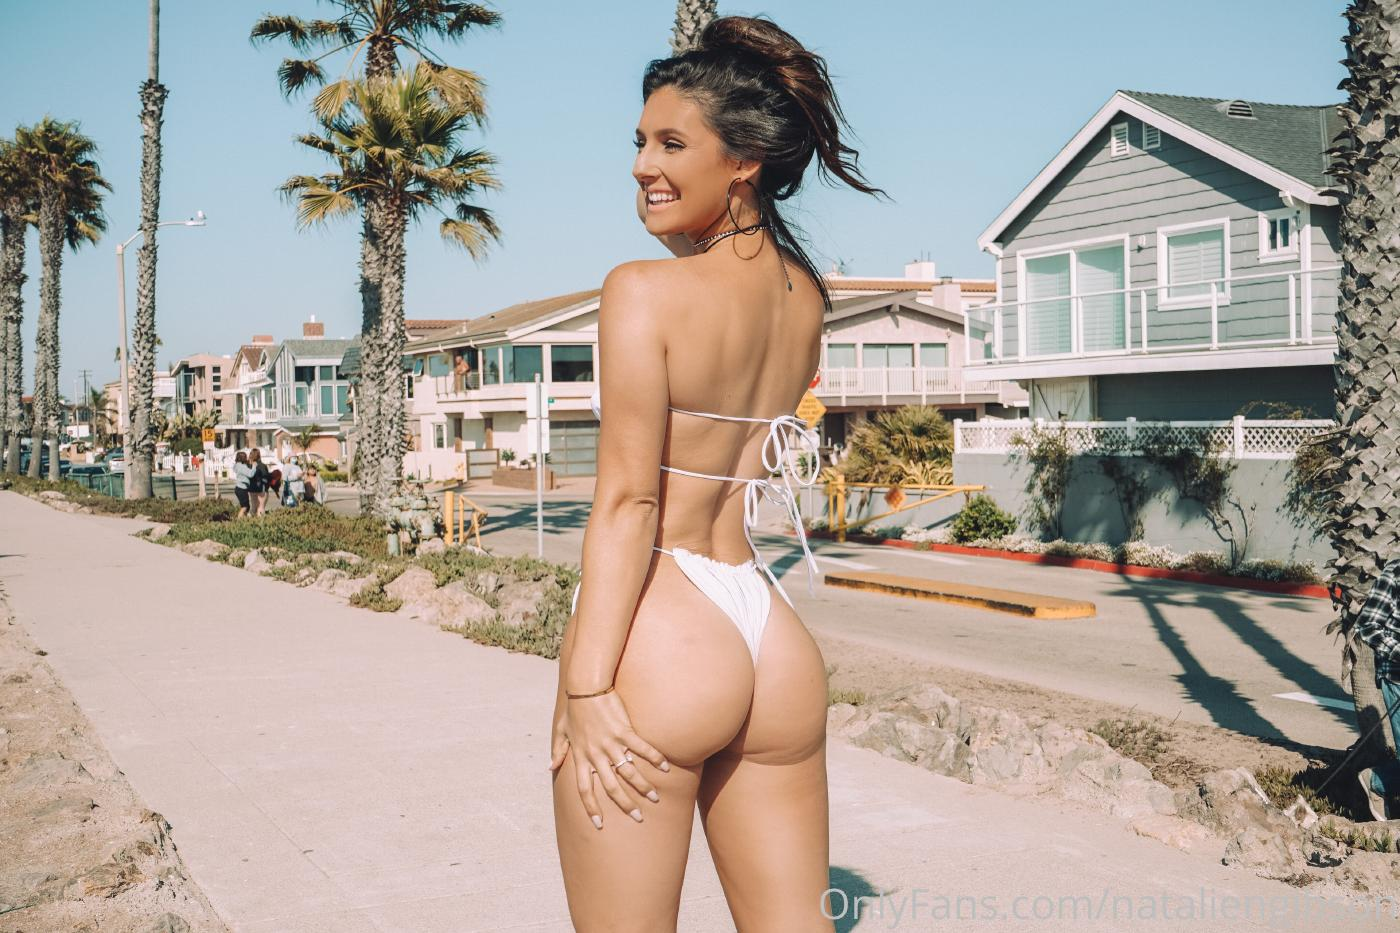 Natalie Gibson Beach Bikini Onlyfans Set Leaked 0001